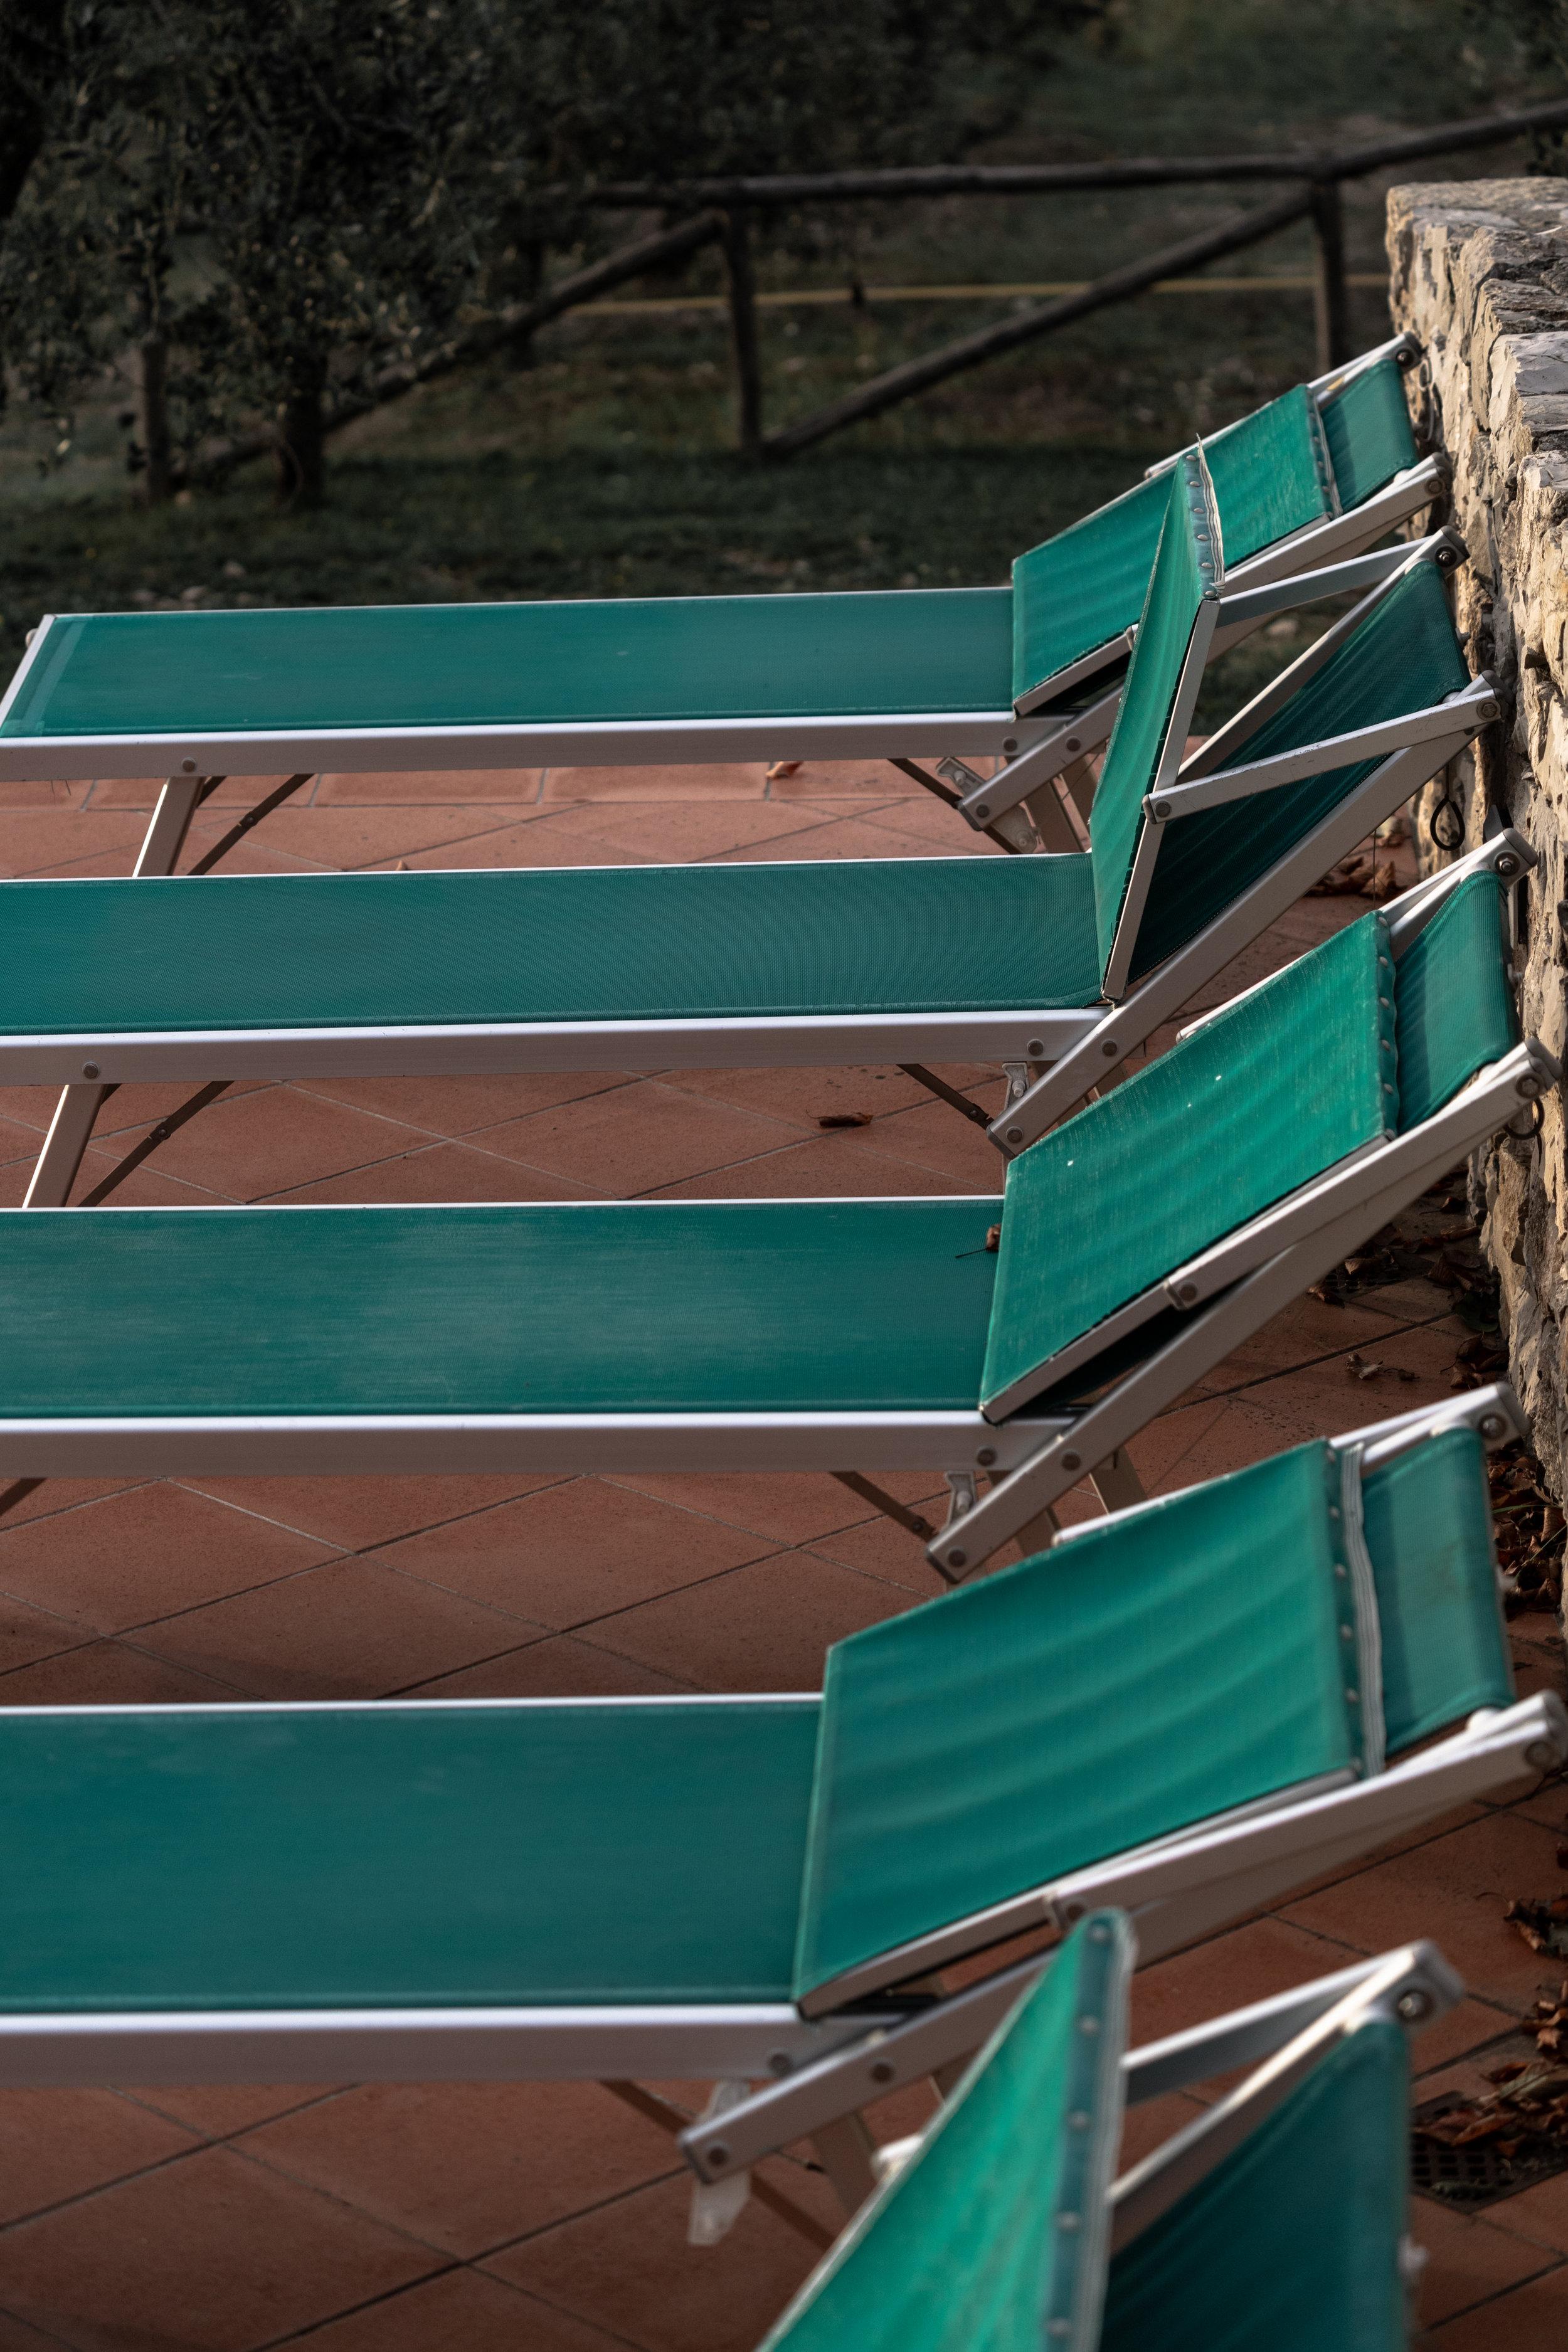 Pool chairs awaiting summer at Castello Di Meleto